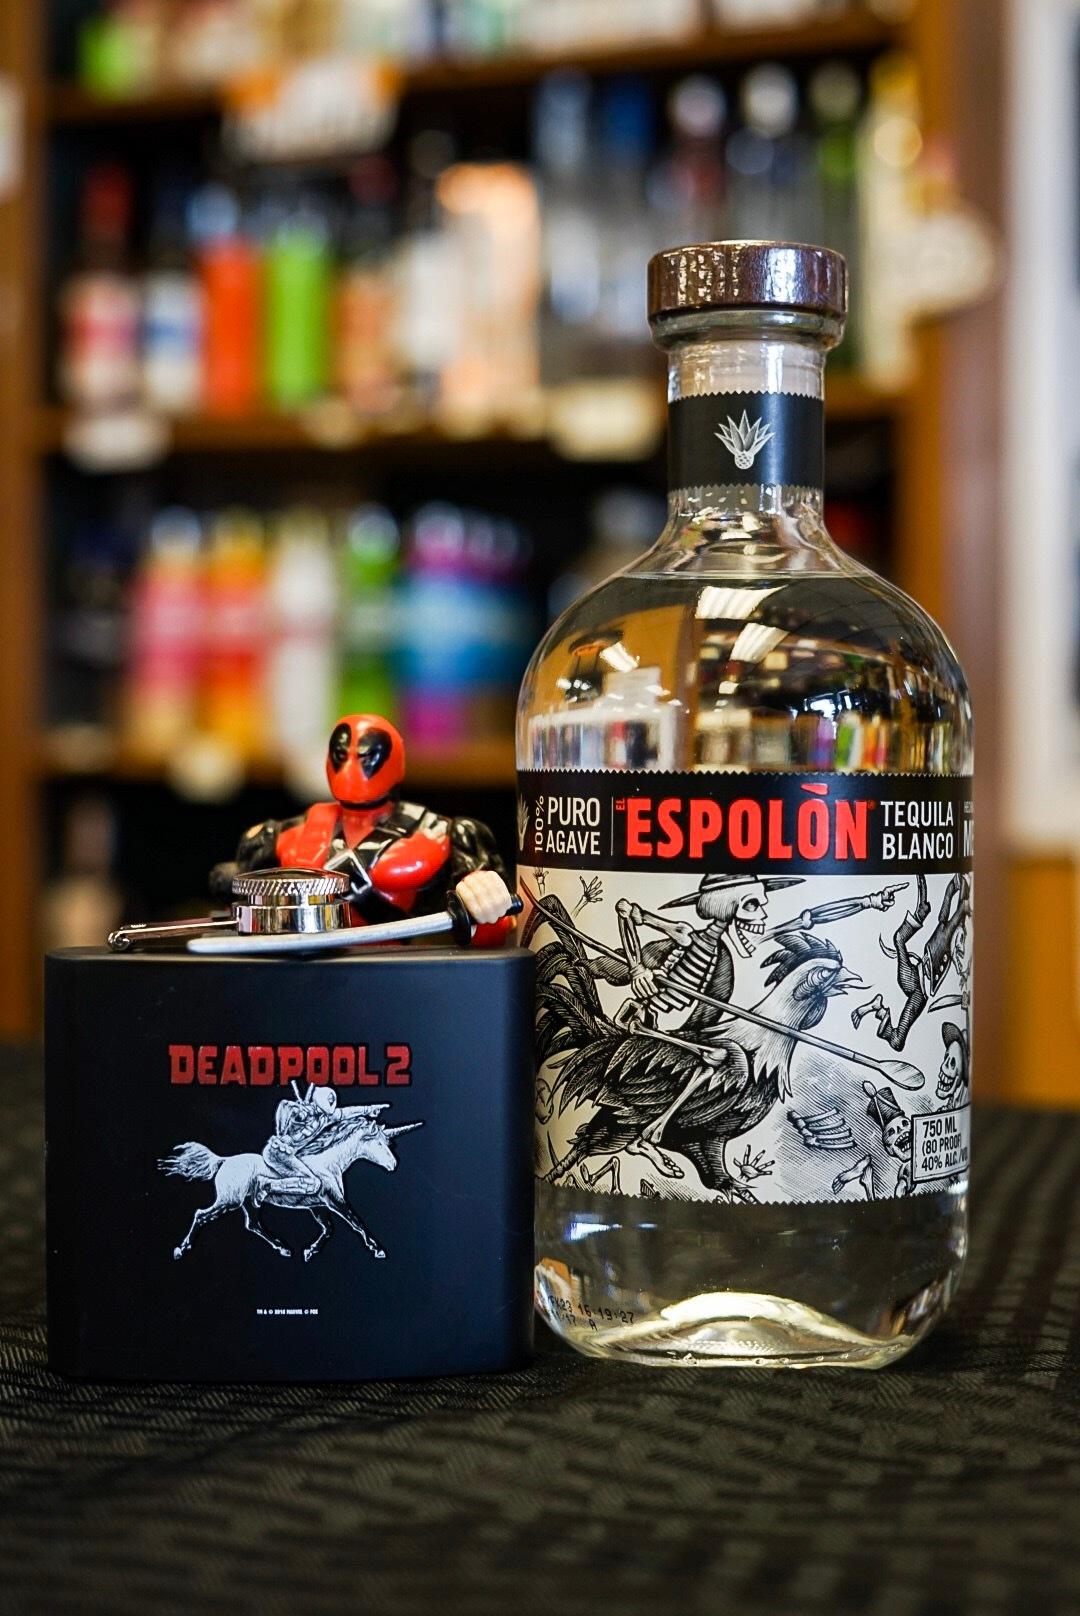 Deadpool by David Alanis